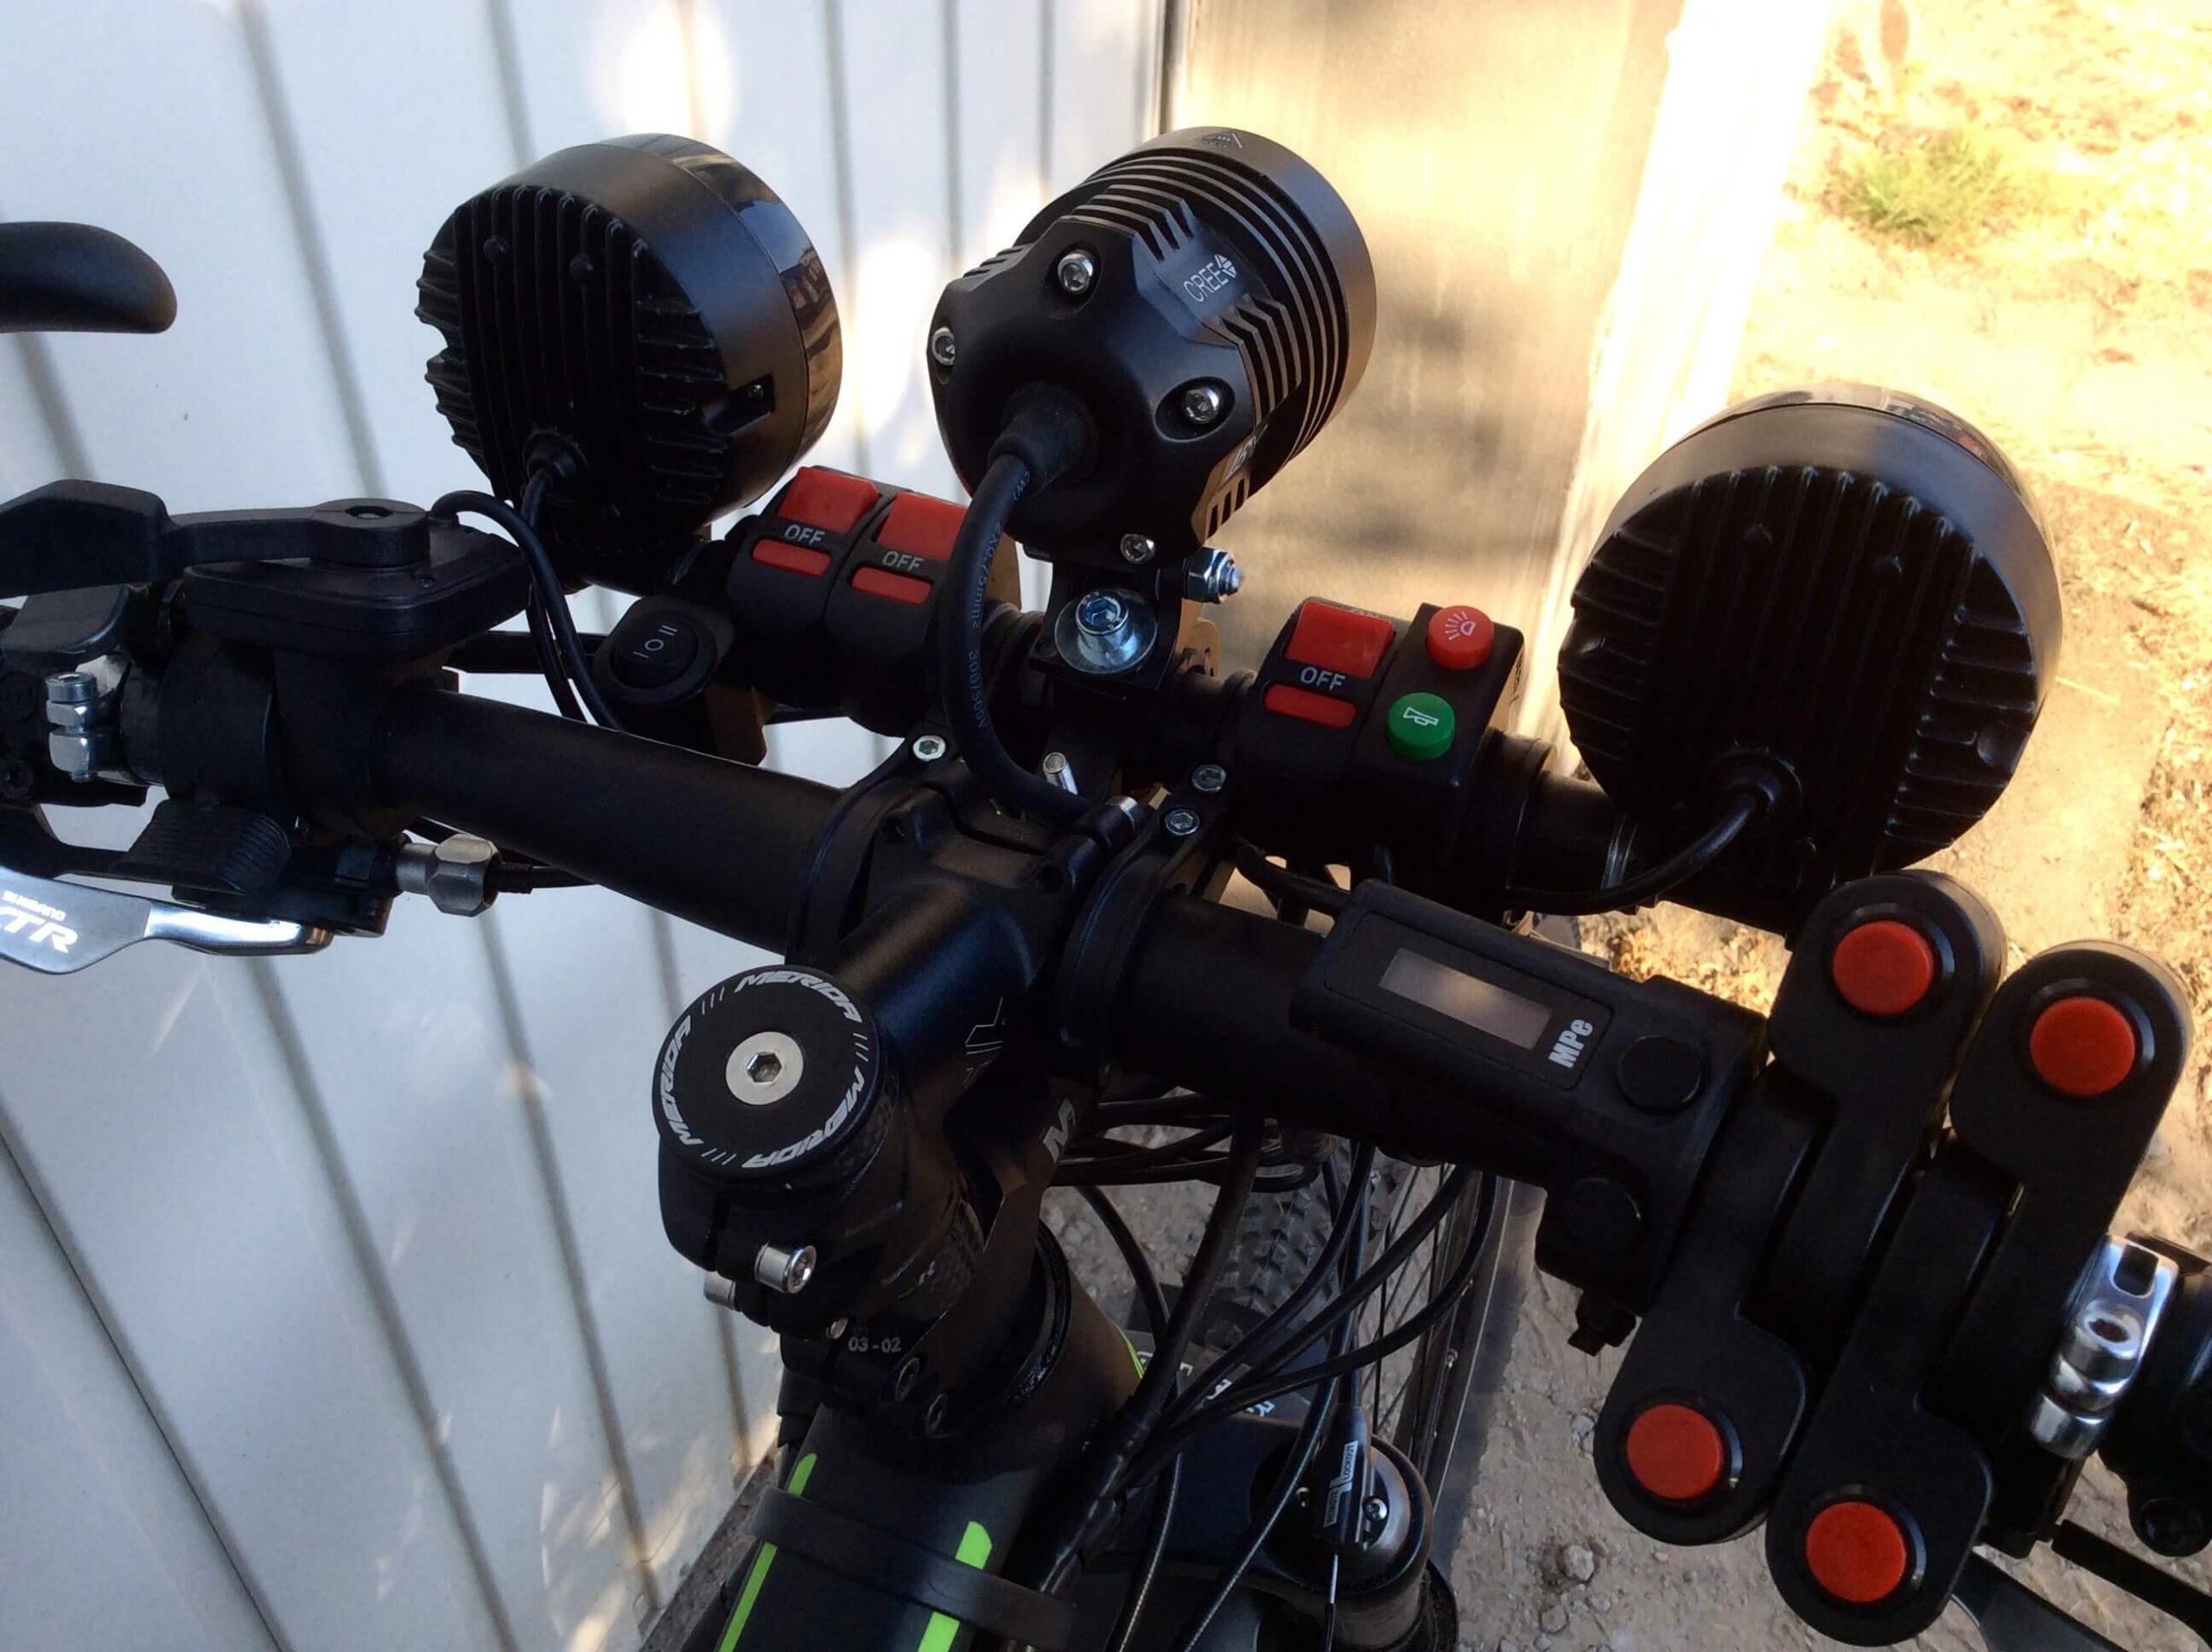 Merida e-bike with MPe